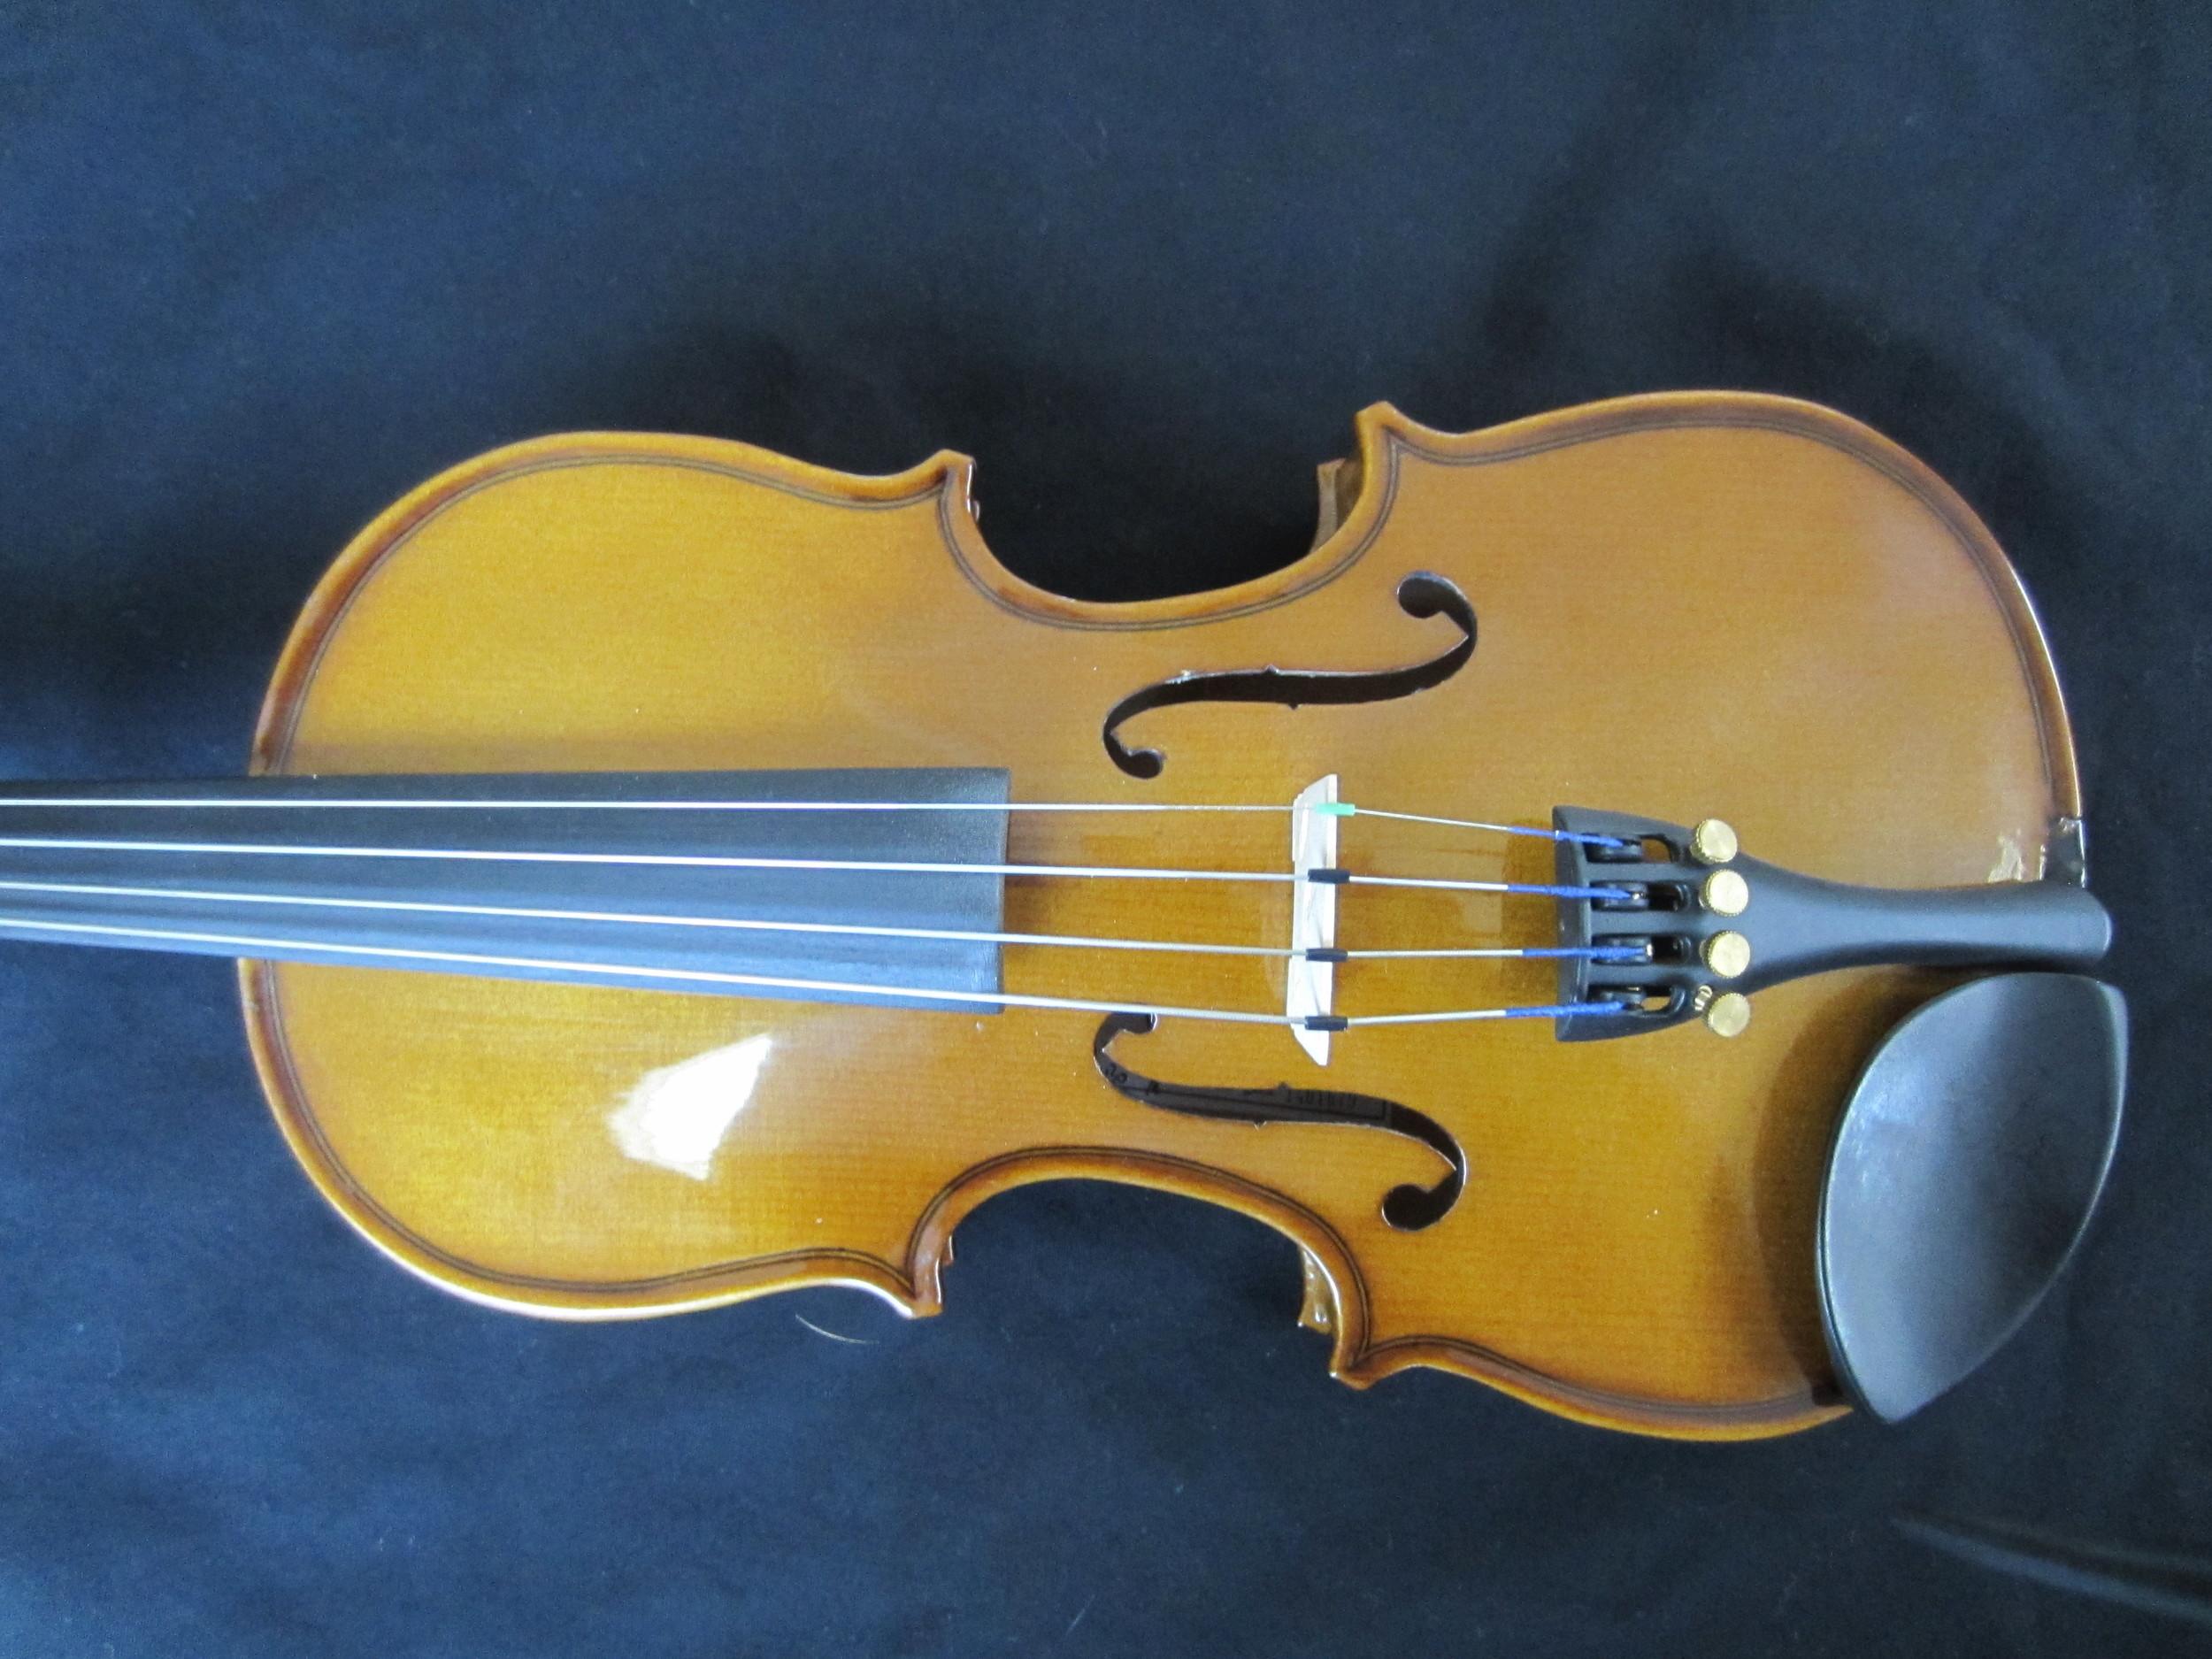 Cremona Violin for Beginners